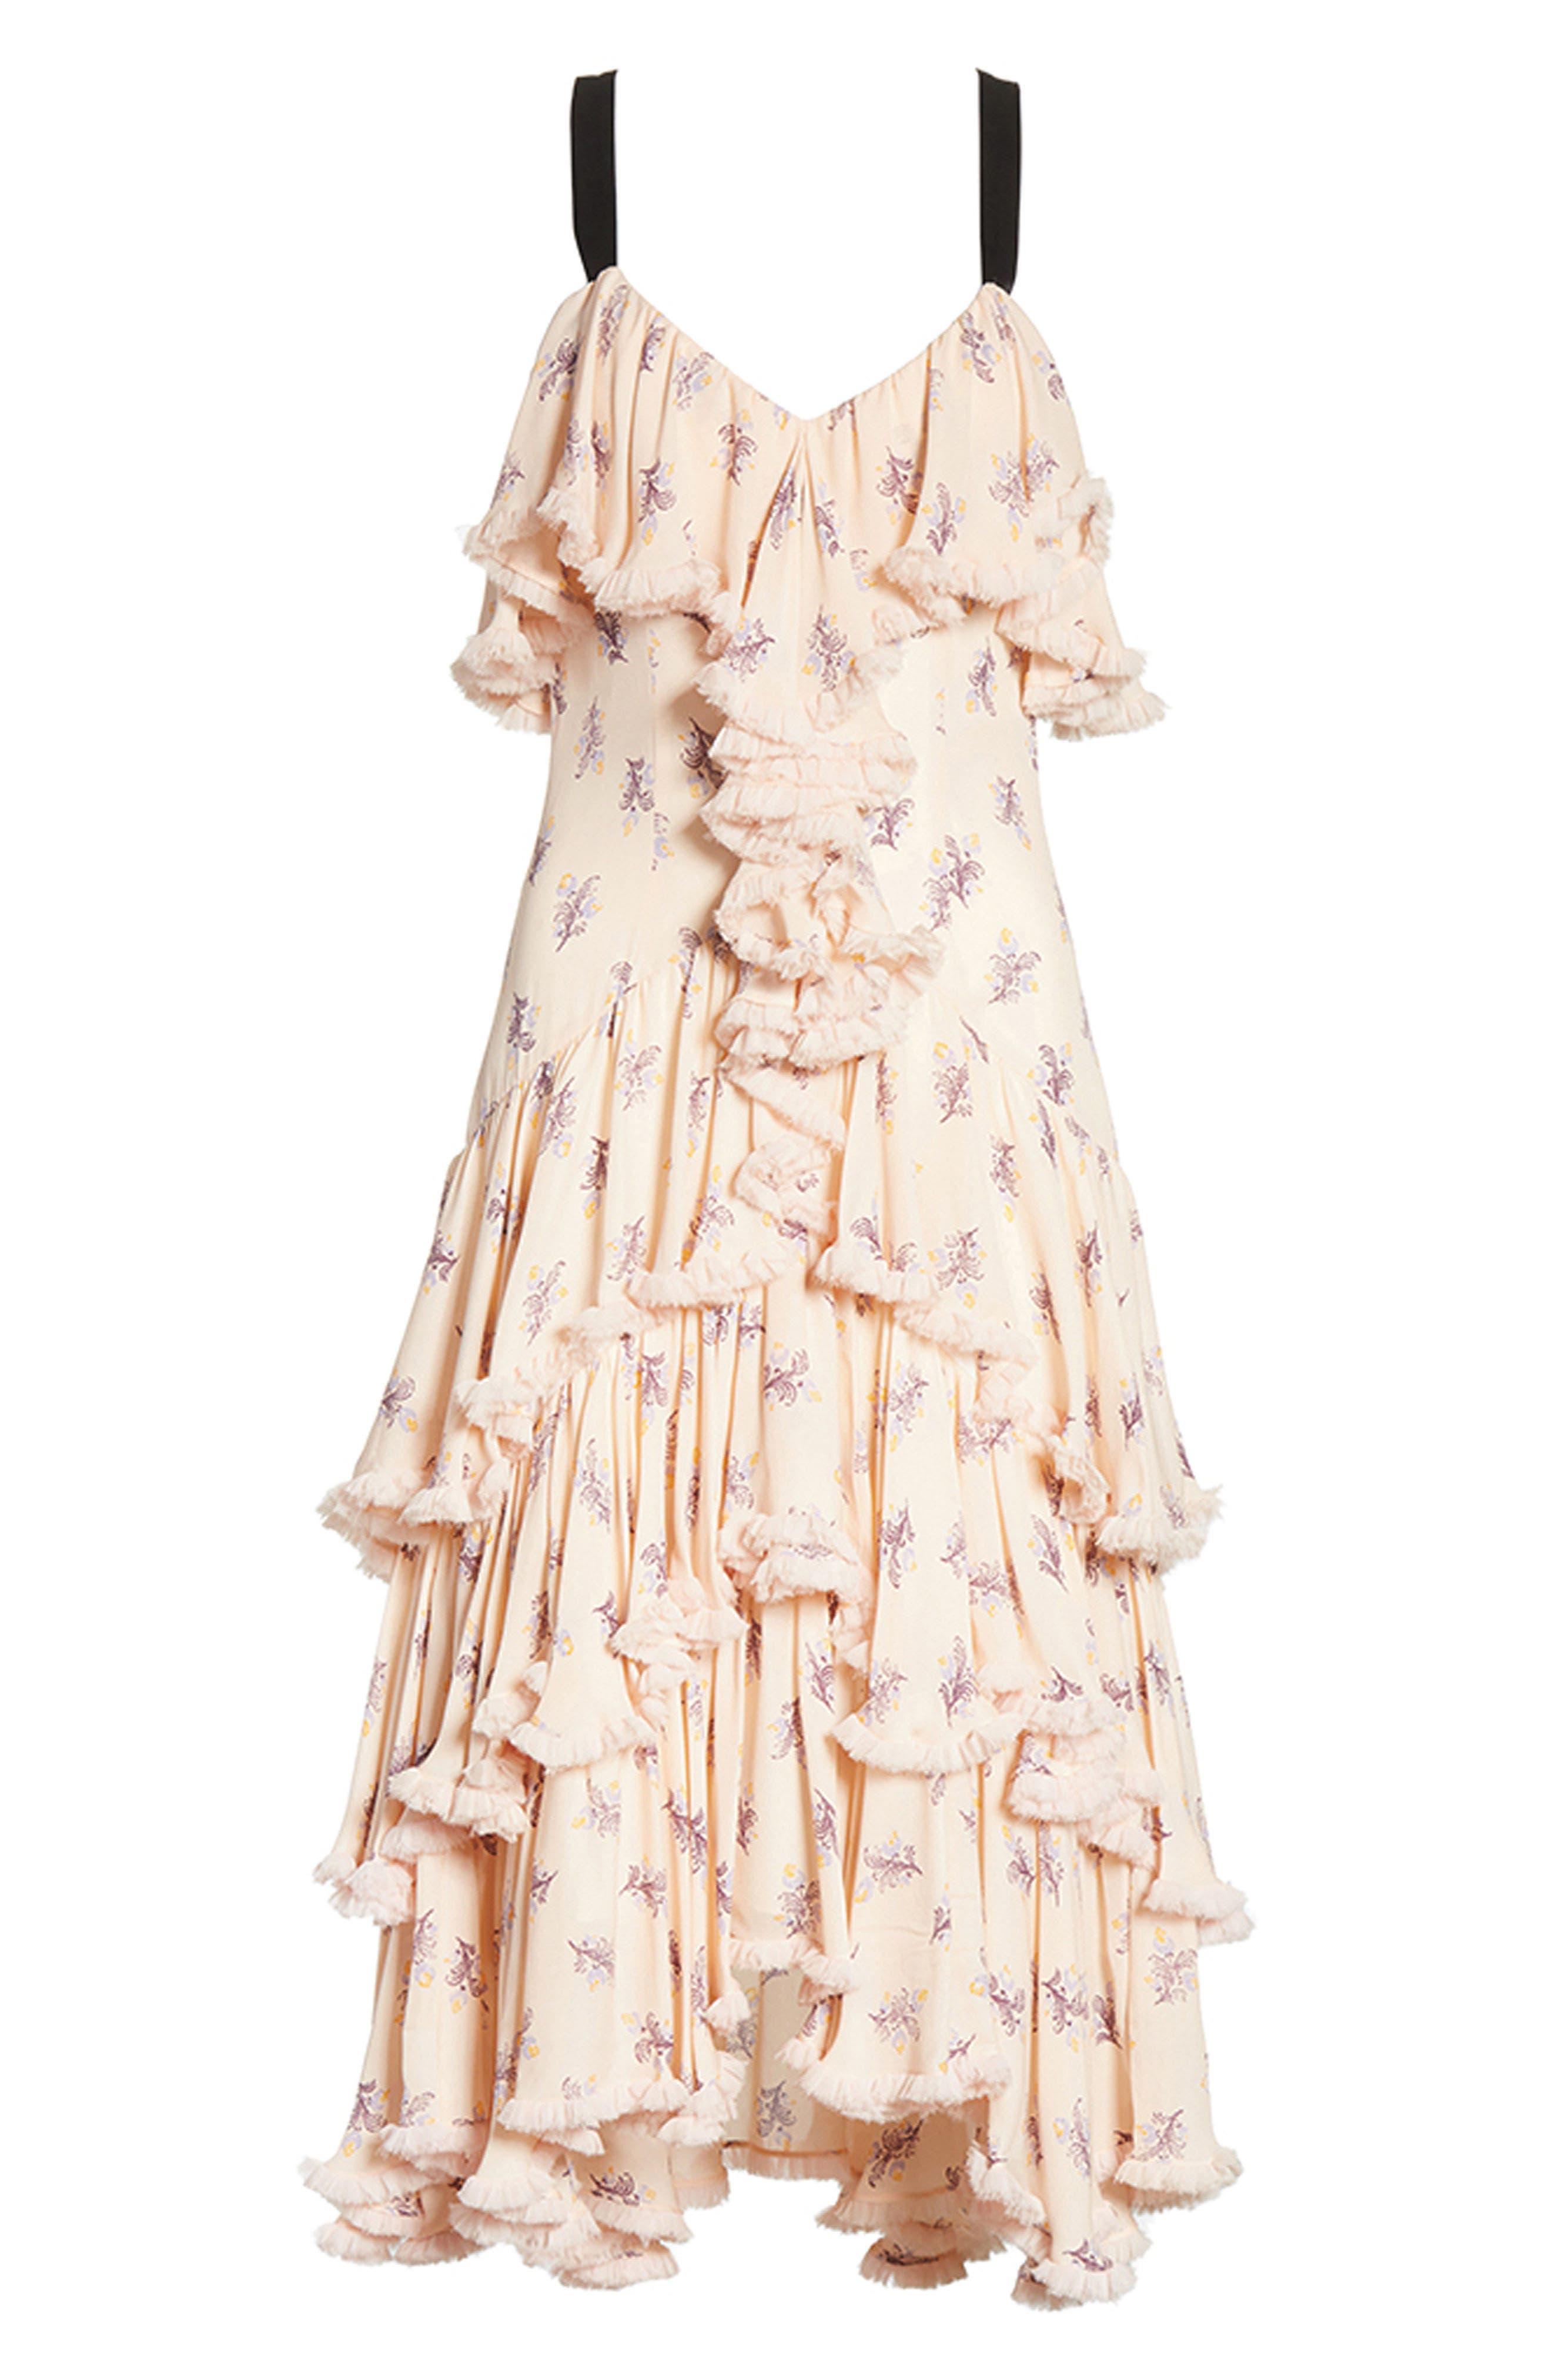 Edie Floral Print Tiered Silk Dress,                             Alternate thumbnail 7, color,                             699